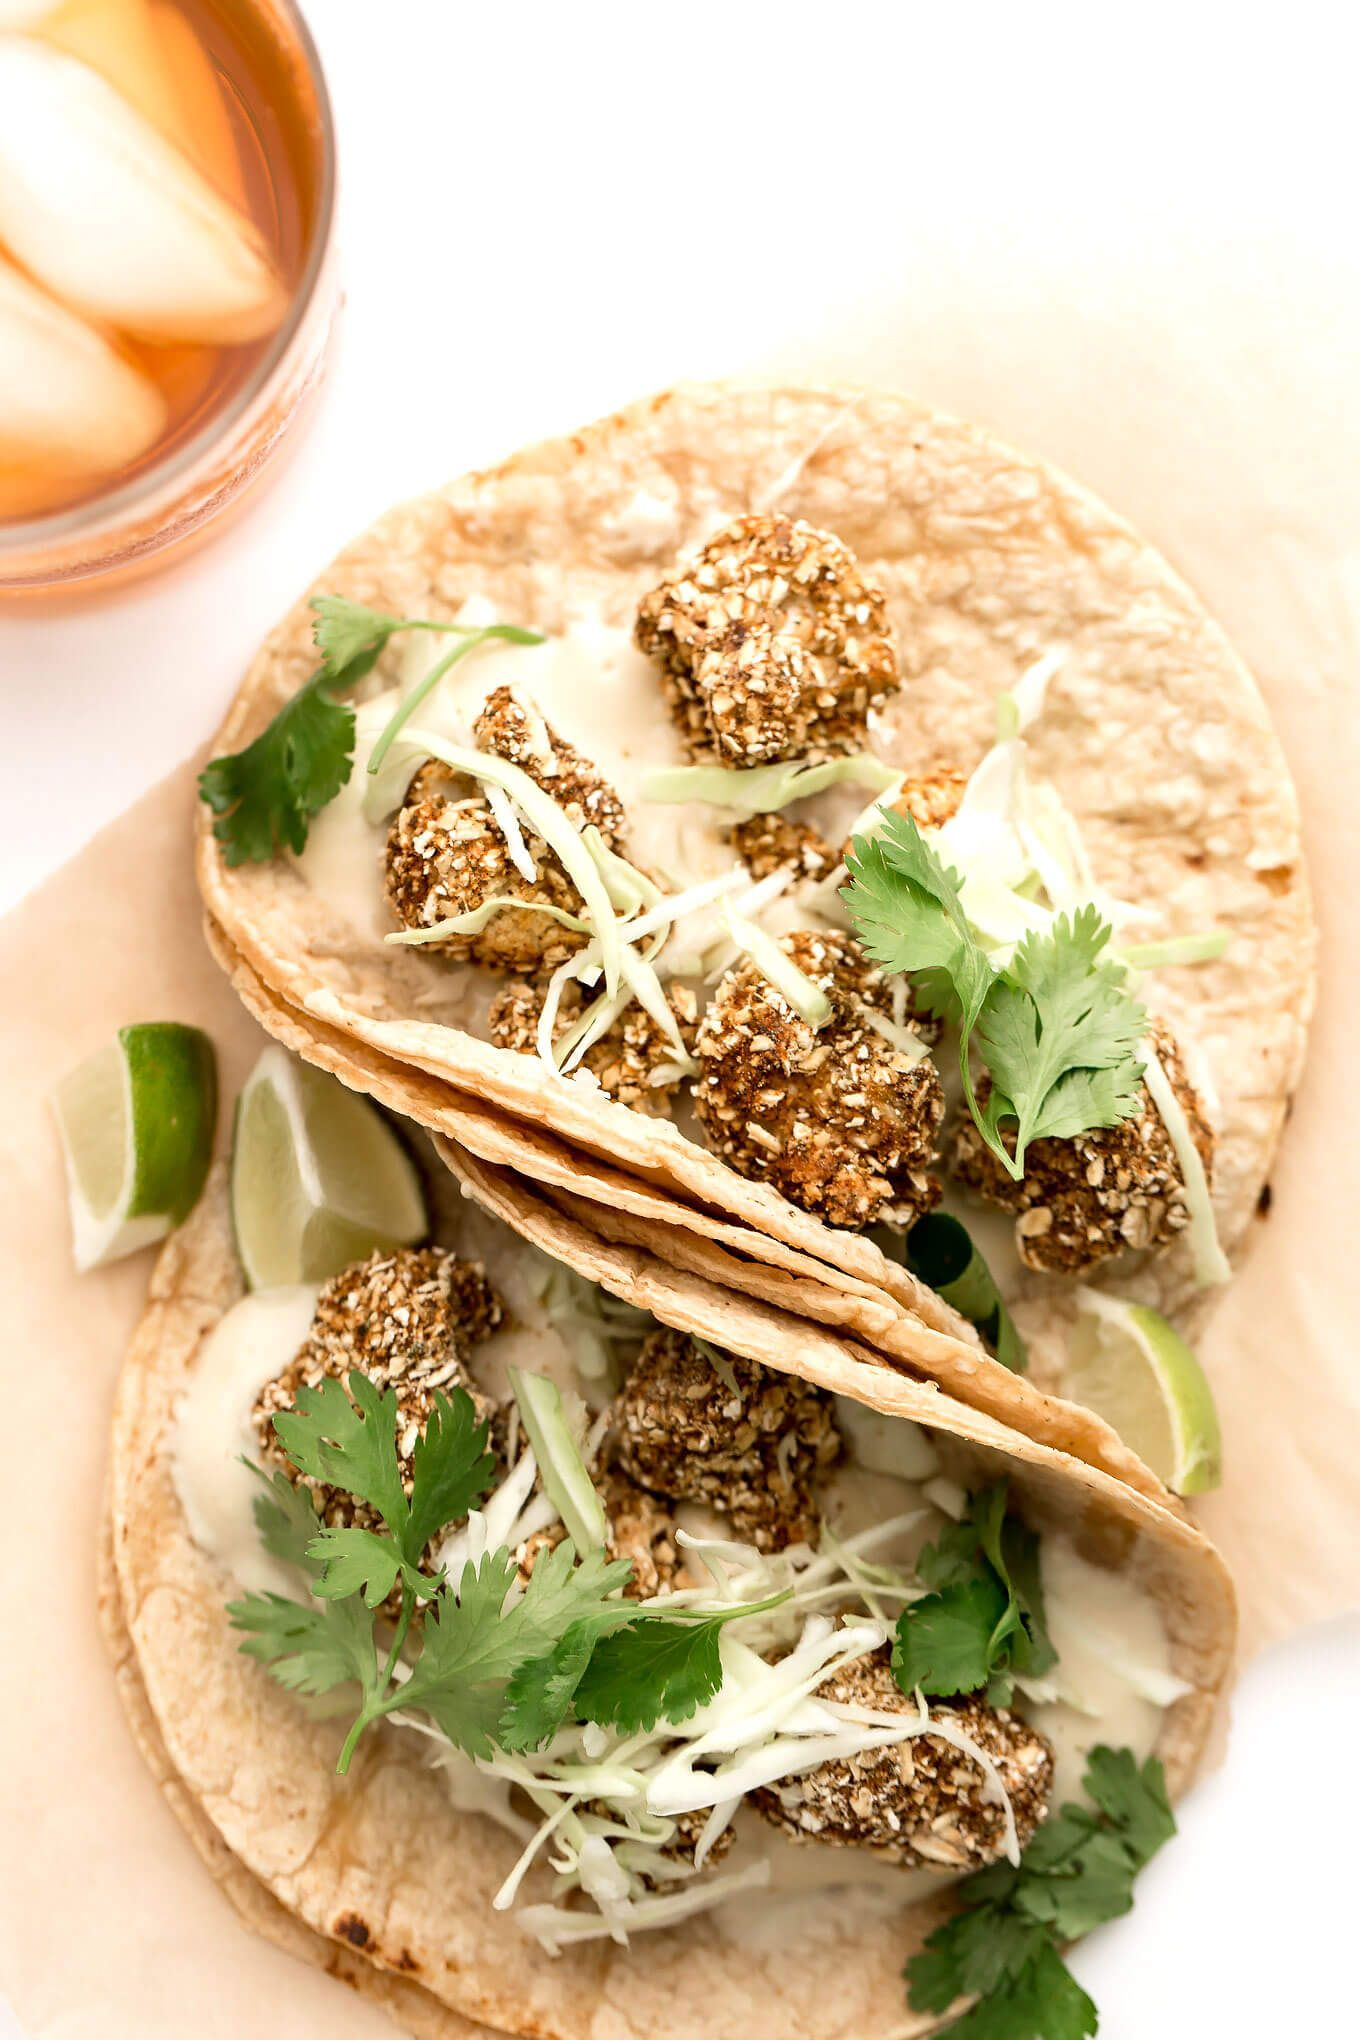 Vegan crispy cauliflower tacos with cashew mozzarella recipe vegan crispy cauliflower tacos with cashew mozzarella forumfinder Choice Image